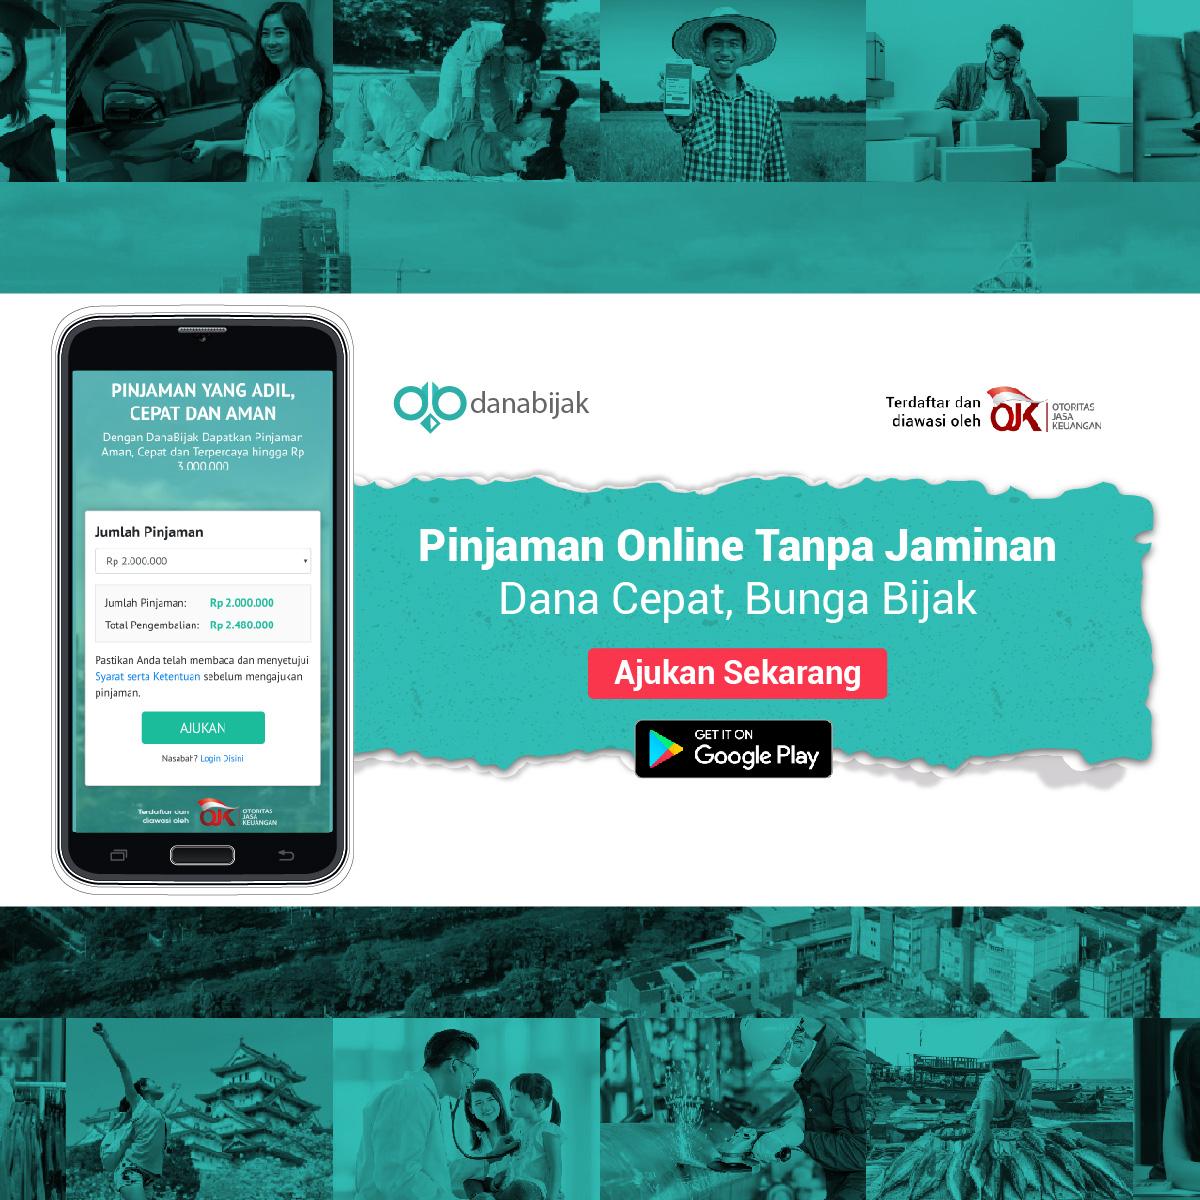 Danabijak Pinjaman Online Tanpa Jaminan Dana Cepat Bunga Bijak